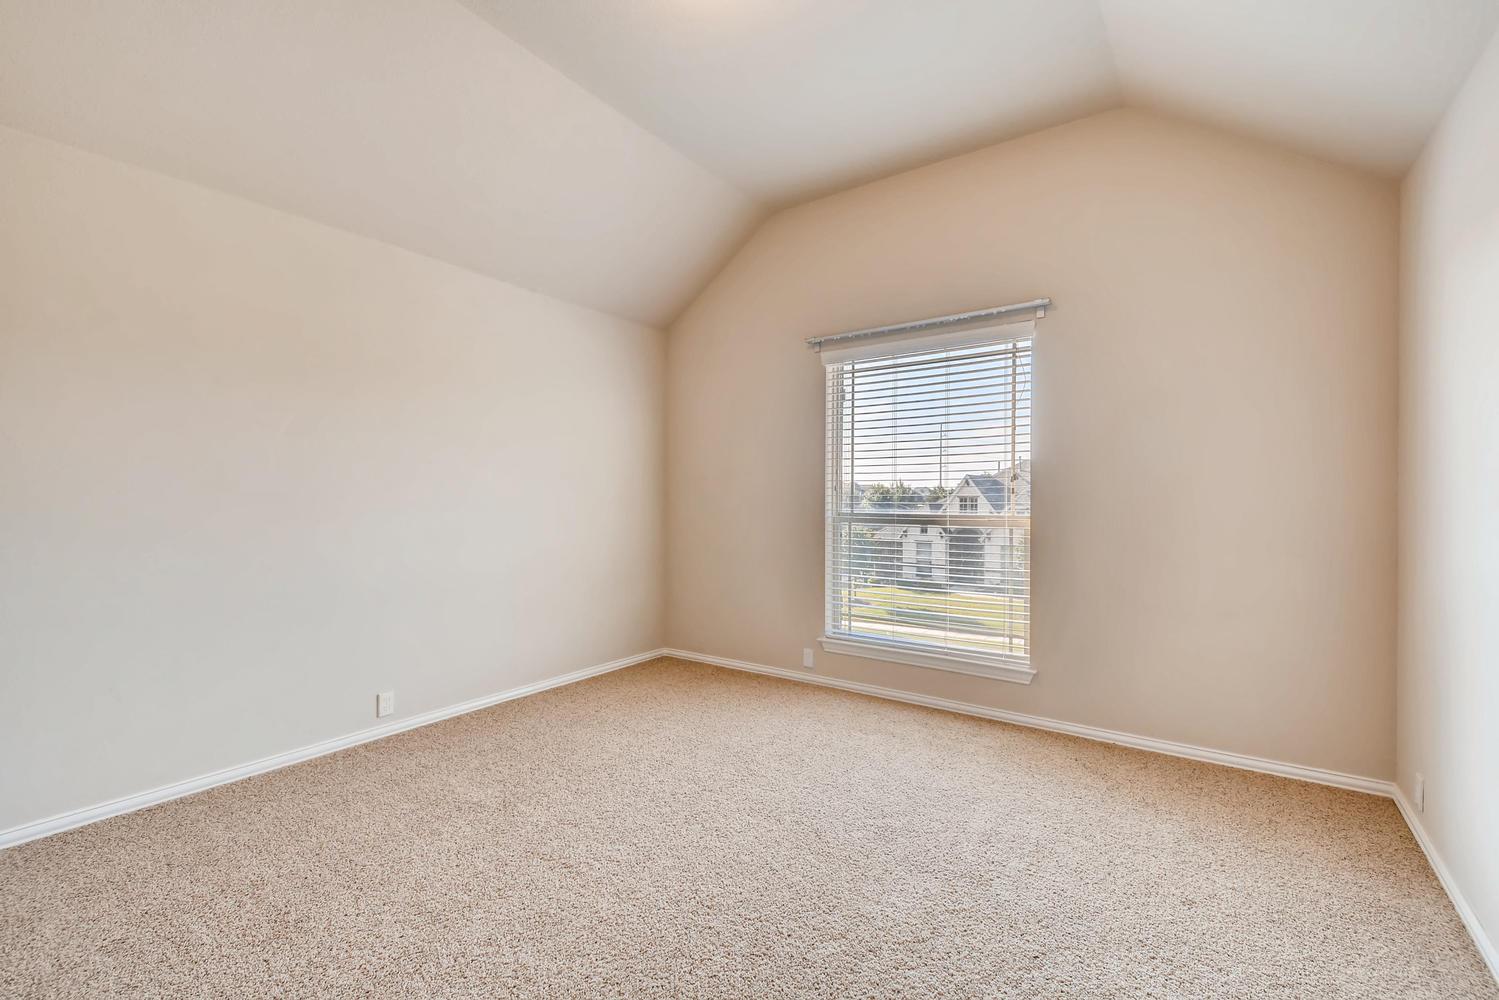 Photo of 1451 Crescent Valley Drive, Prosper, TX, 75078